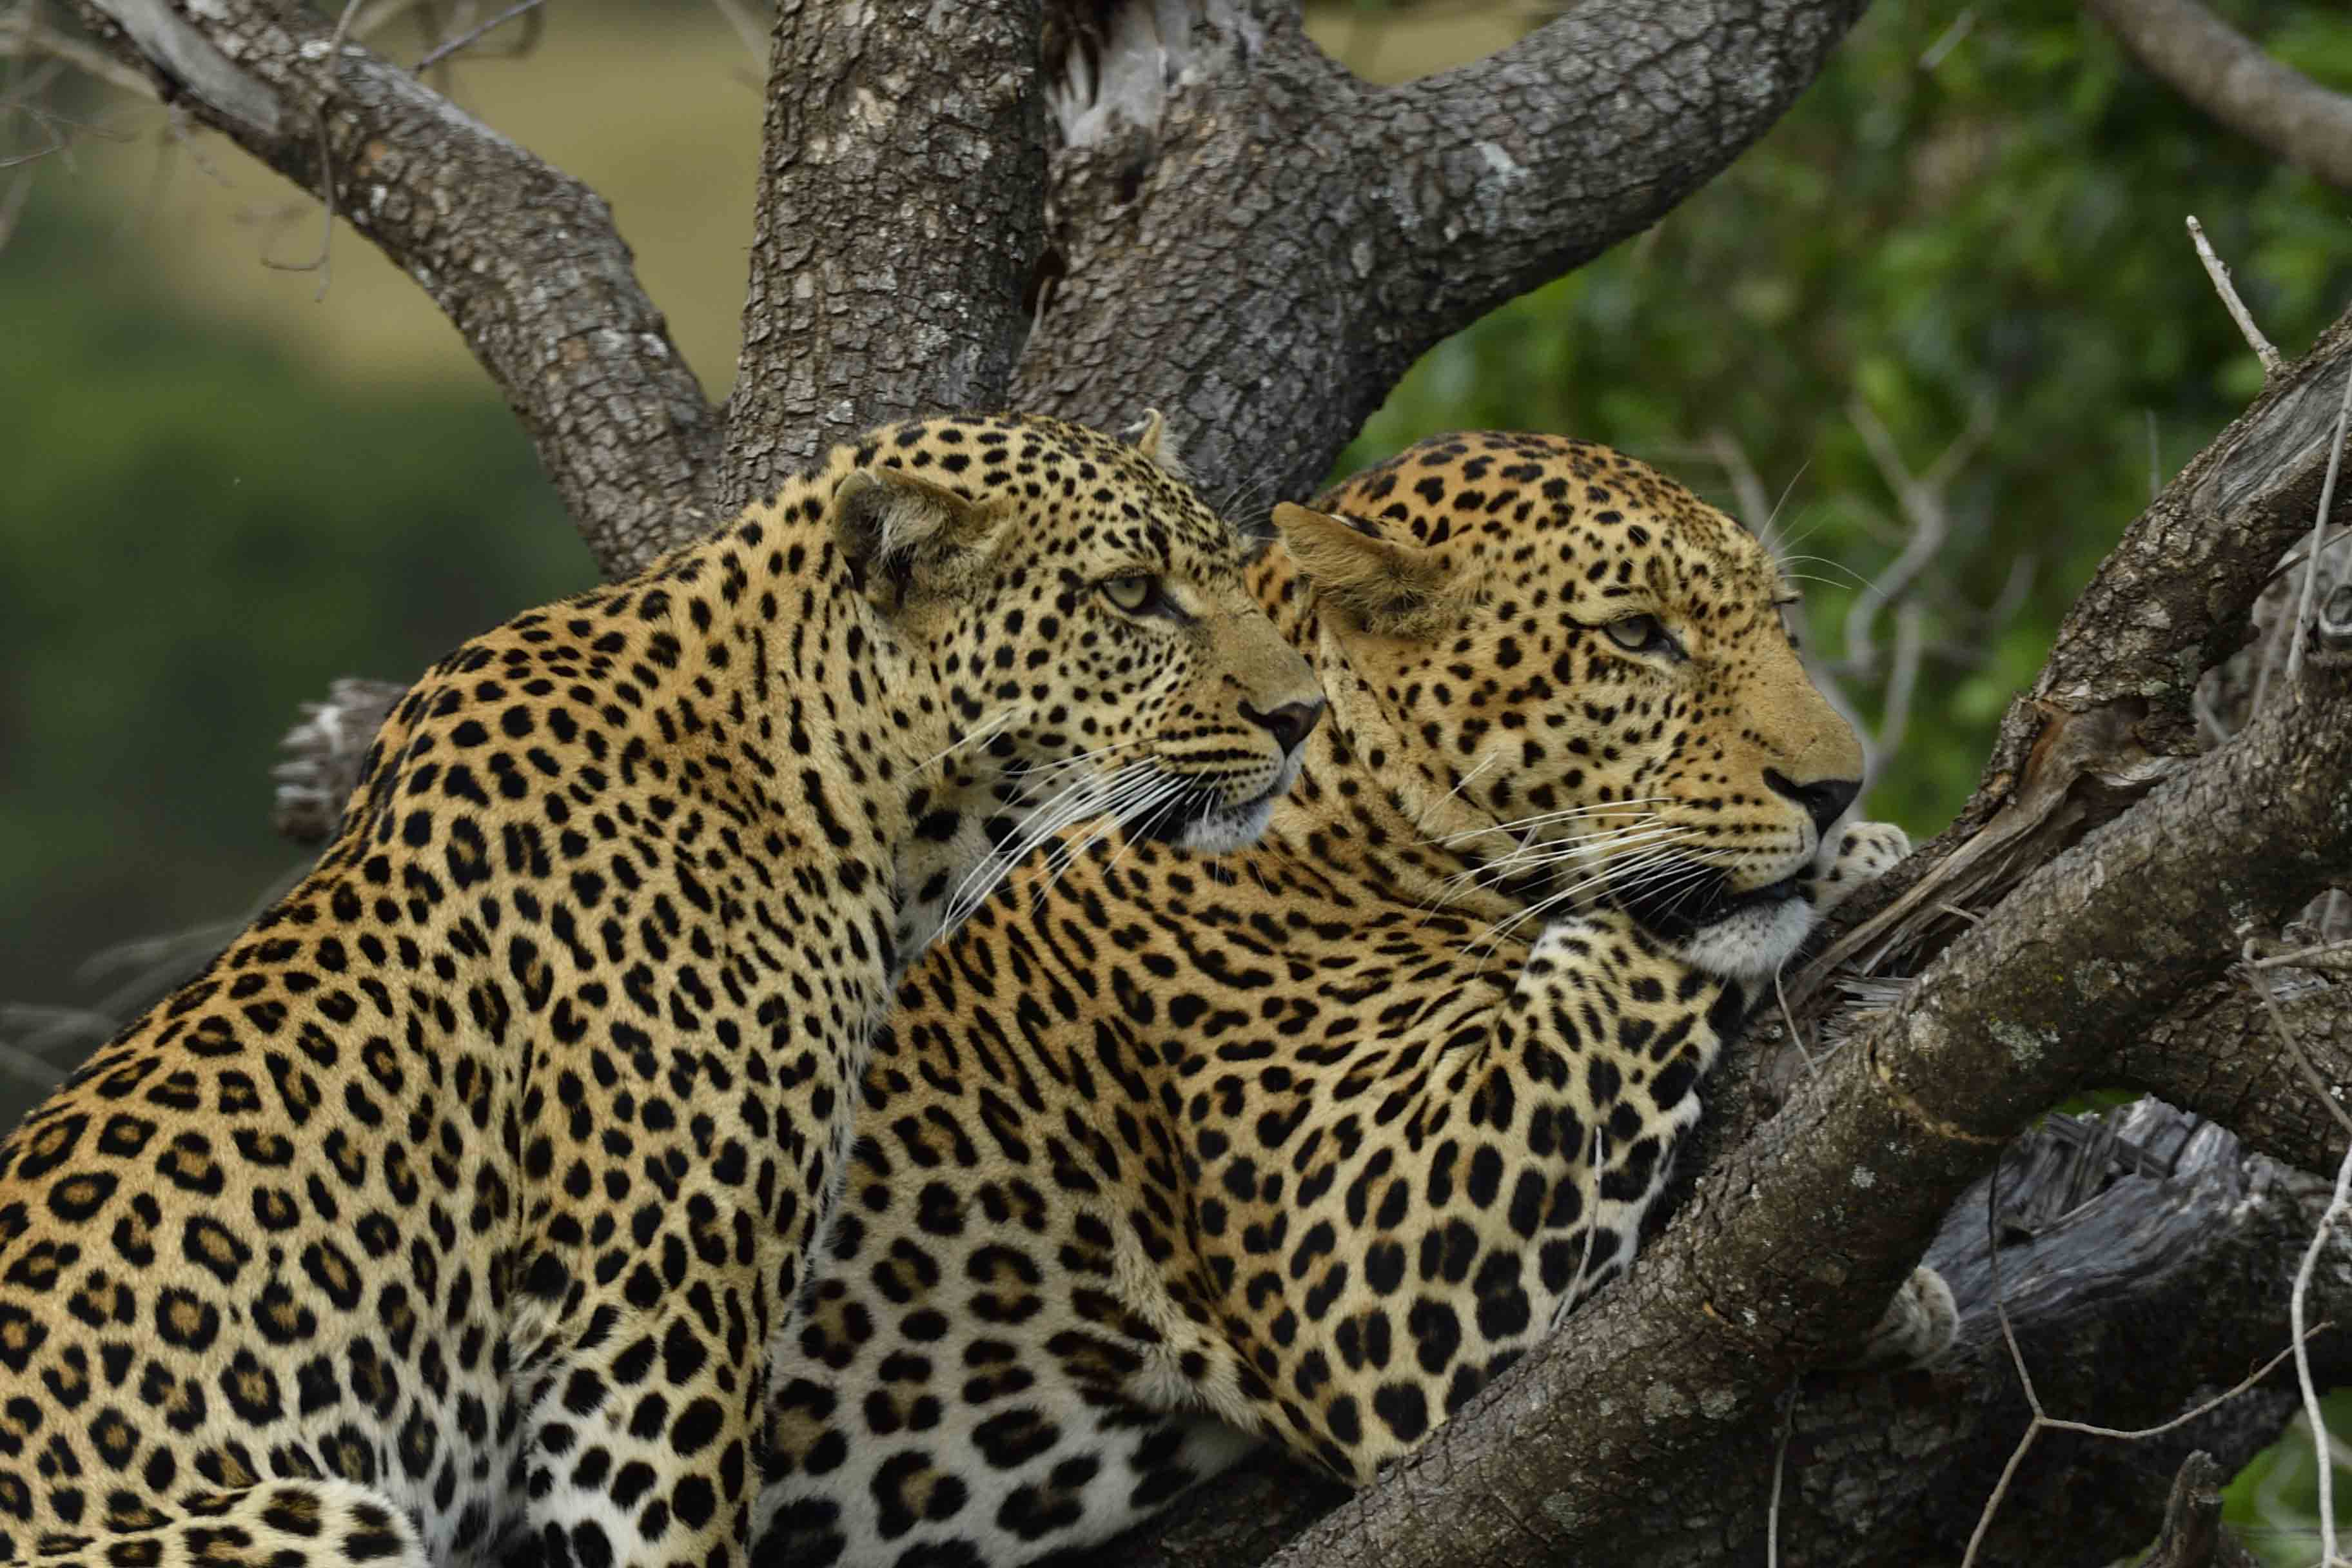 Leopards in Mara North Conservancy by Daniele Donati